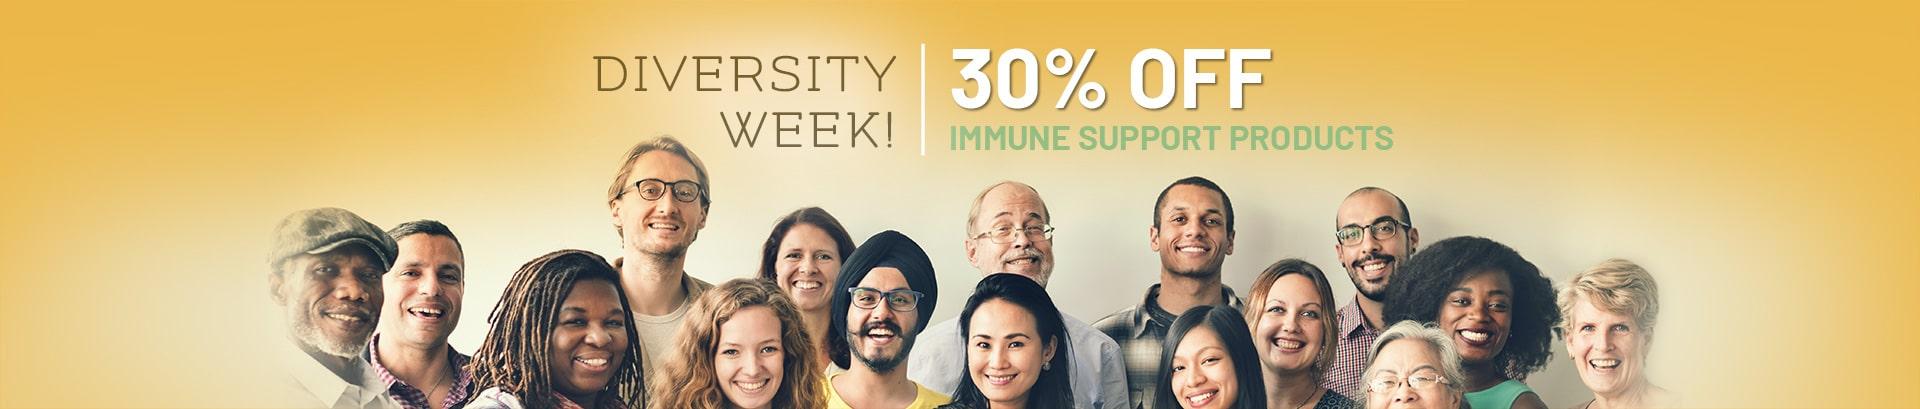 Diversity Week Pure Hemp Immune